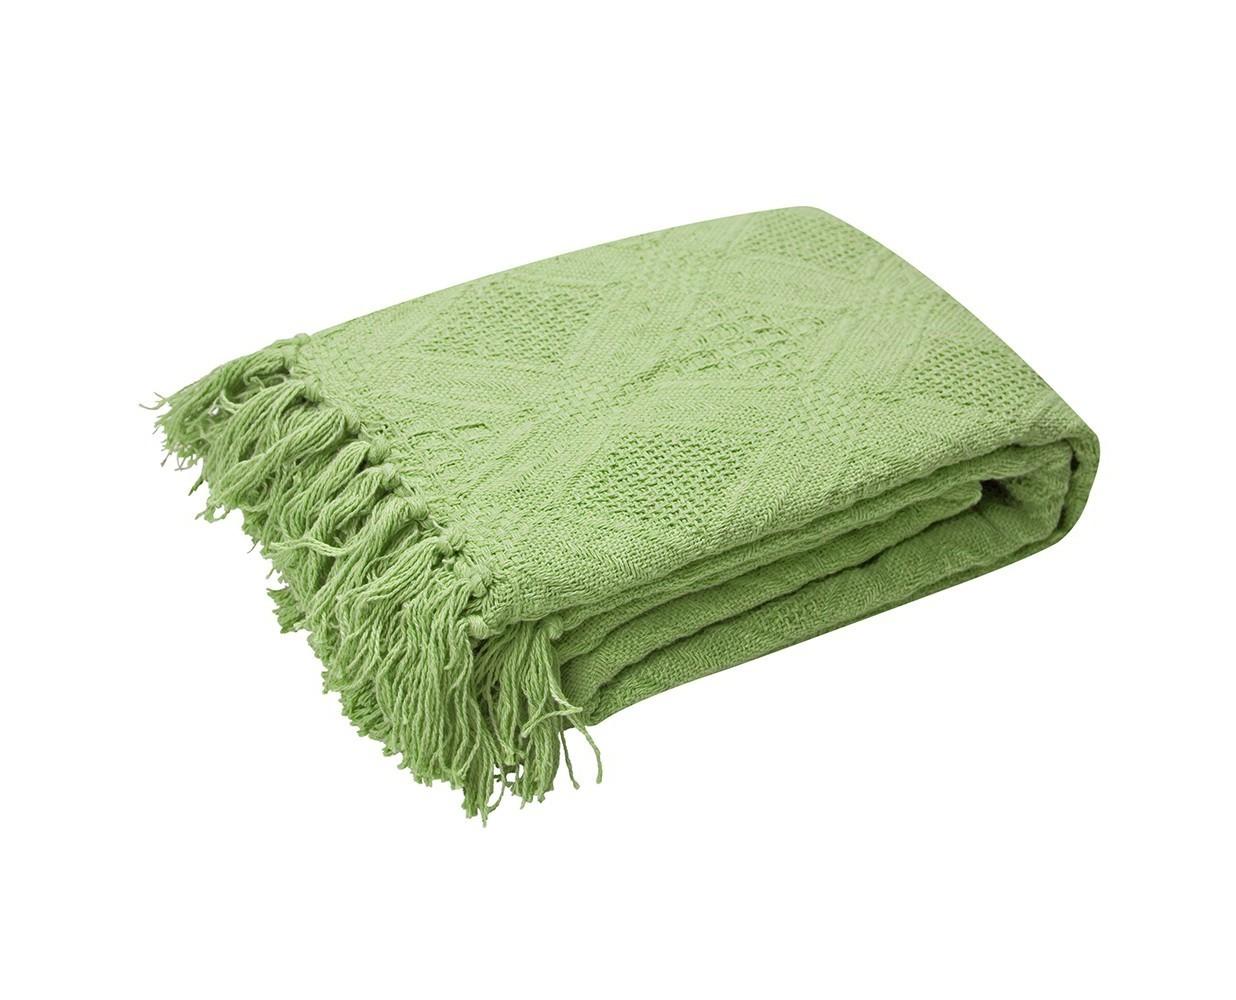 Покрывало Зелёный чайПокрывала<br>Хлопковое объемное вязаное покрывало светло-зеленого цвета.&amp;amp;nbsp;&amp;lt;div&amp;gt;Край покрывала оформлен кистями.&amp;amp;nbsp;&amp;lt;/div&amp;gt;&amp;lt;div&amp;gt;Плотность 330г/м.&amp;lt;/div&amp;gt;<br><br>Material: Хлопок<br>Length см: None<br>Width см: 200<br>Depth см: 240<br>Height см: None<br>Diameter см: None